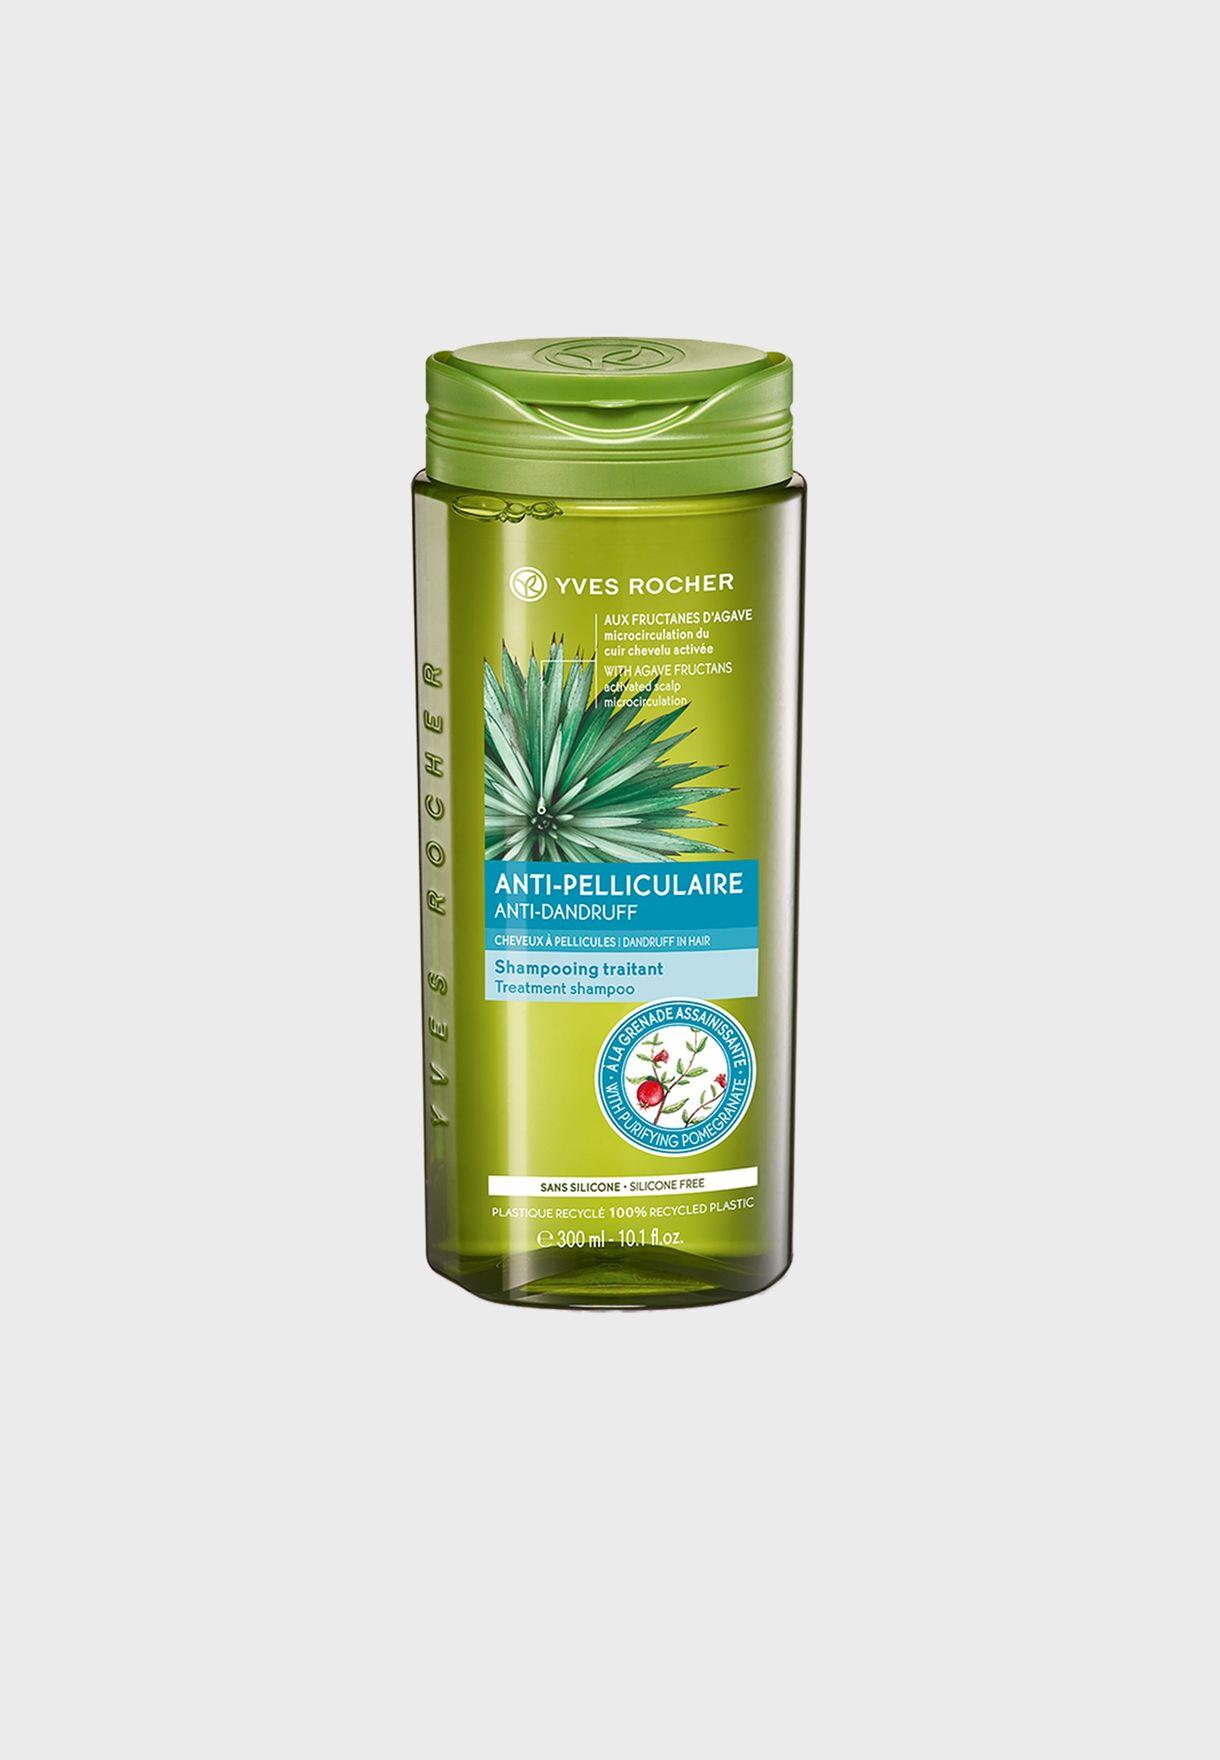 Anti-Dandruff Treatment Shampoo 300ml